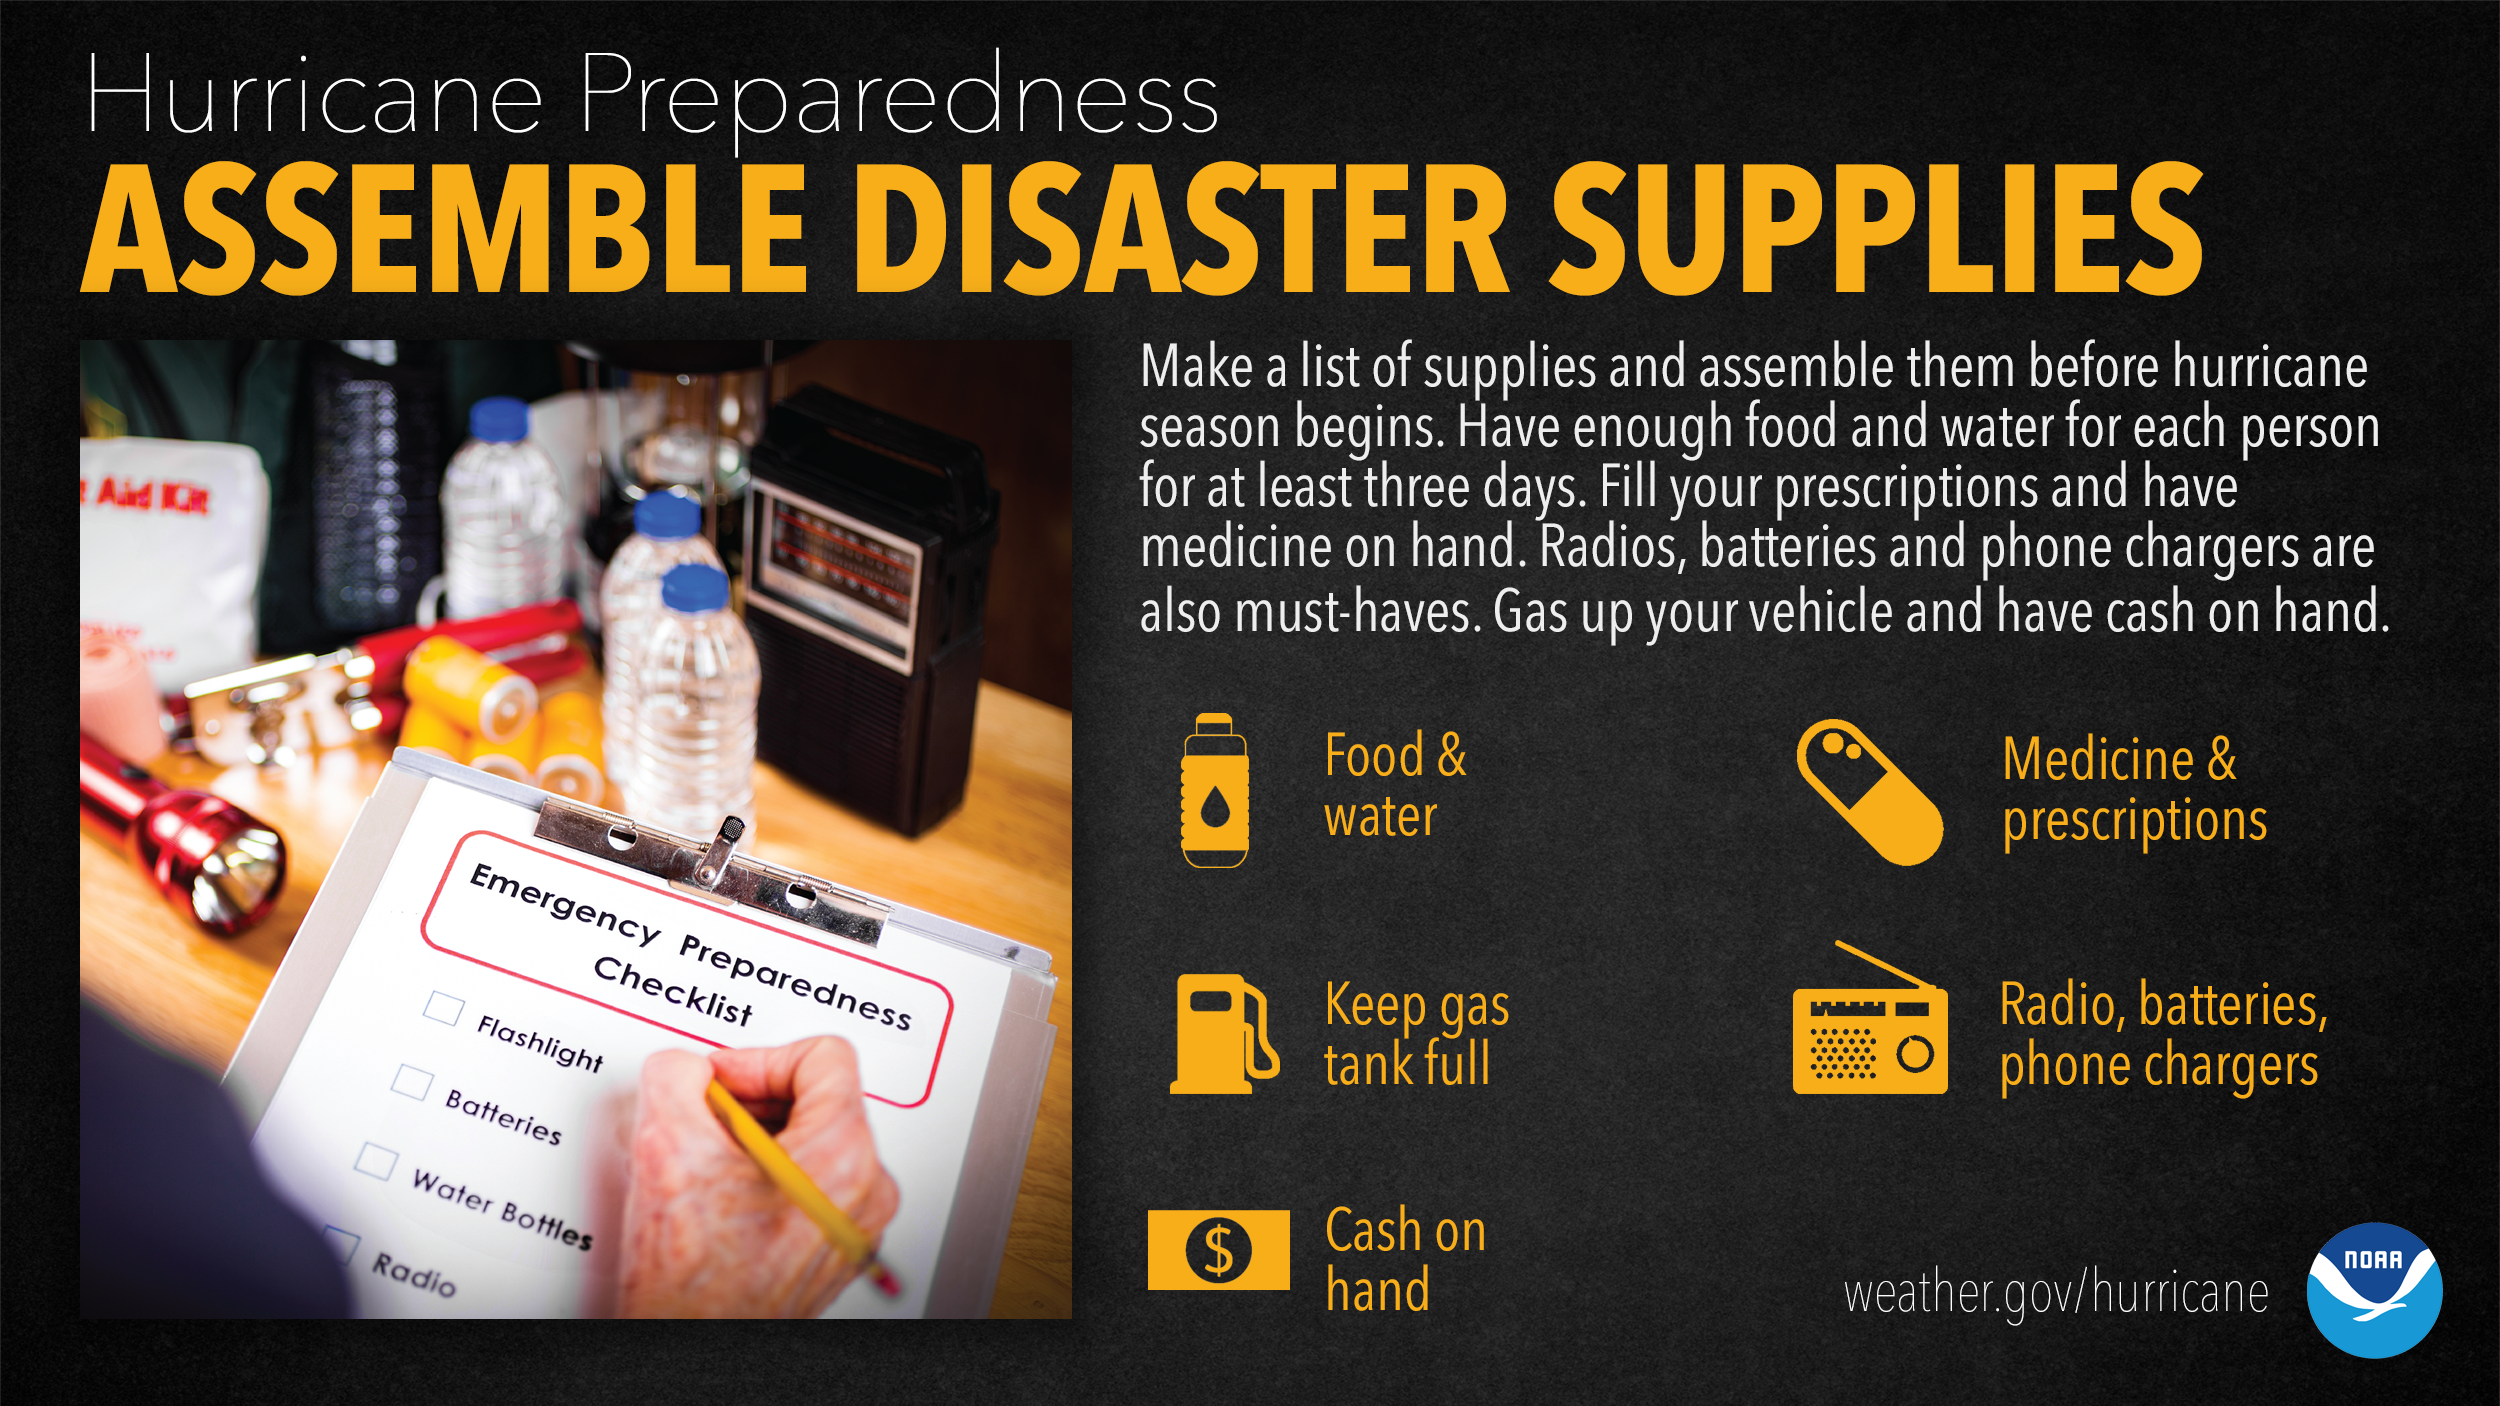 Assemble Disaster Supplies